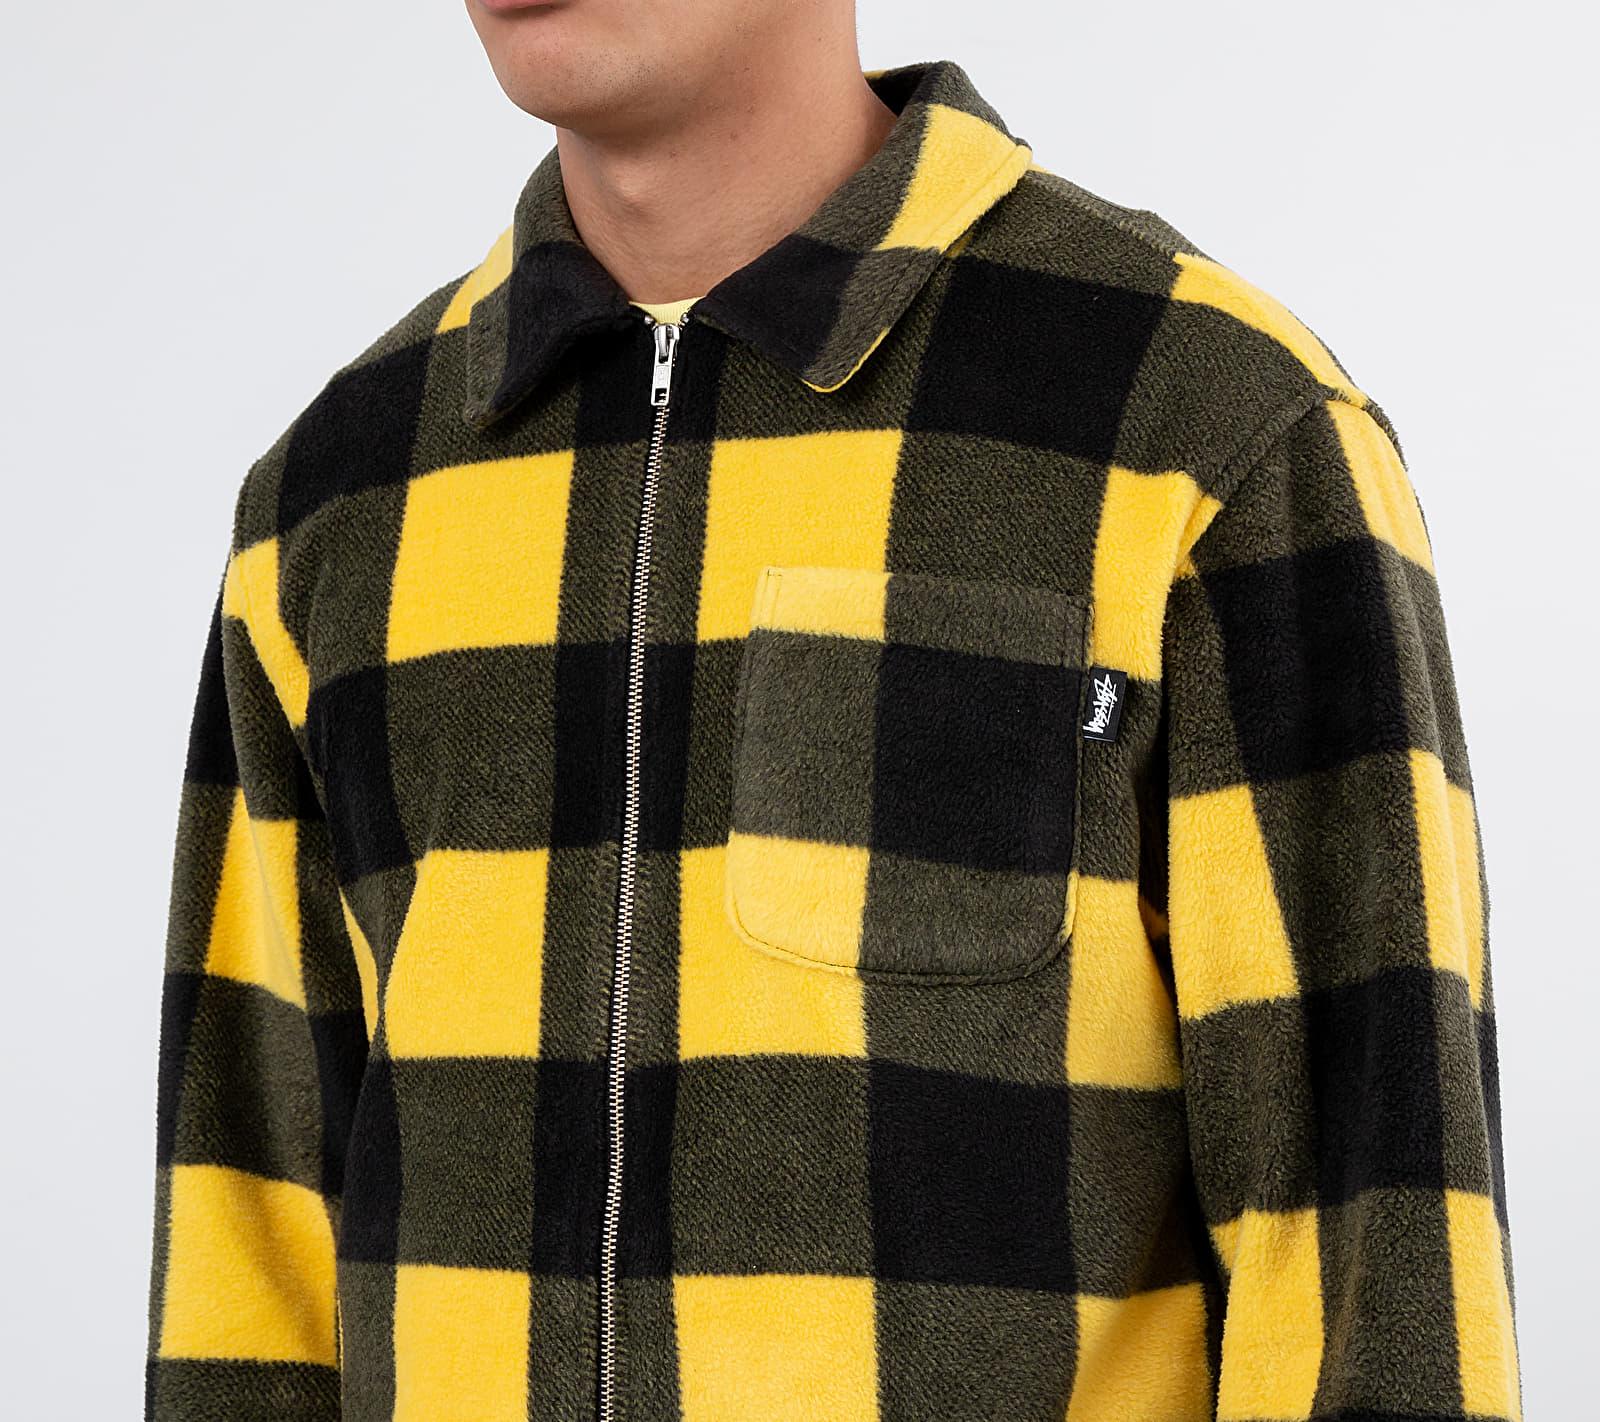 Stüssy Polar Fleece Zip Up Shirt Yellow Check